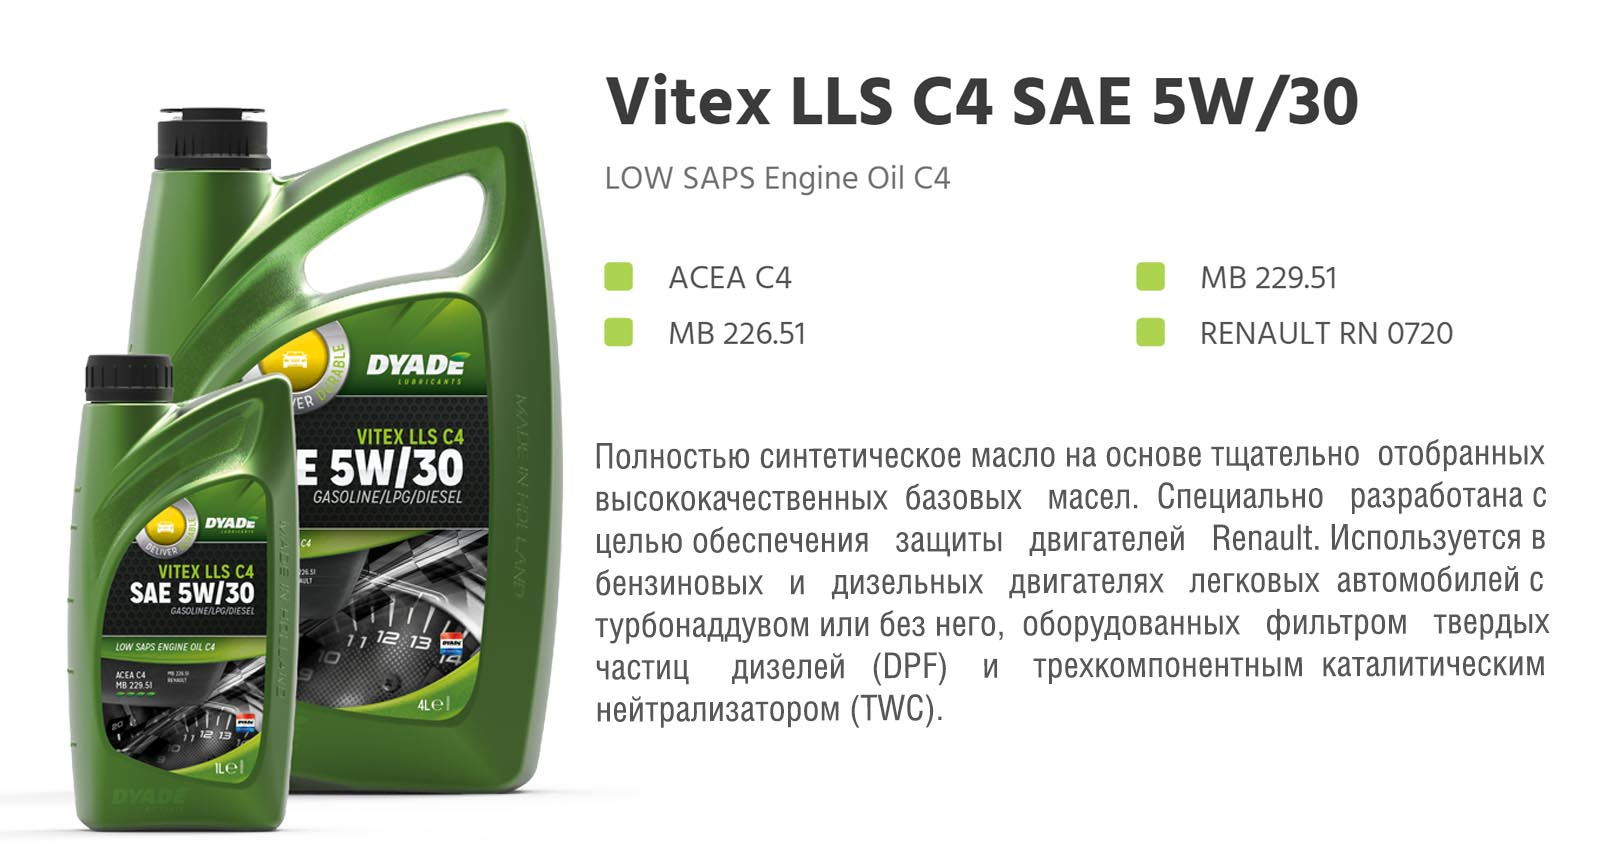 Масло моторное Vitex LLS C4 SAE 5W30 RN0720 (1L) 574969 dyadelubricants